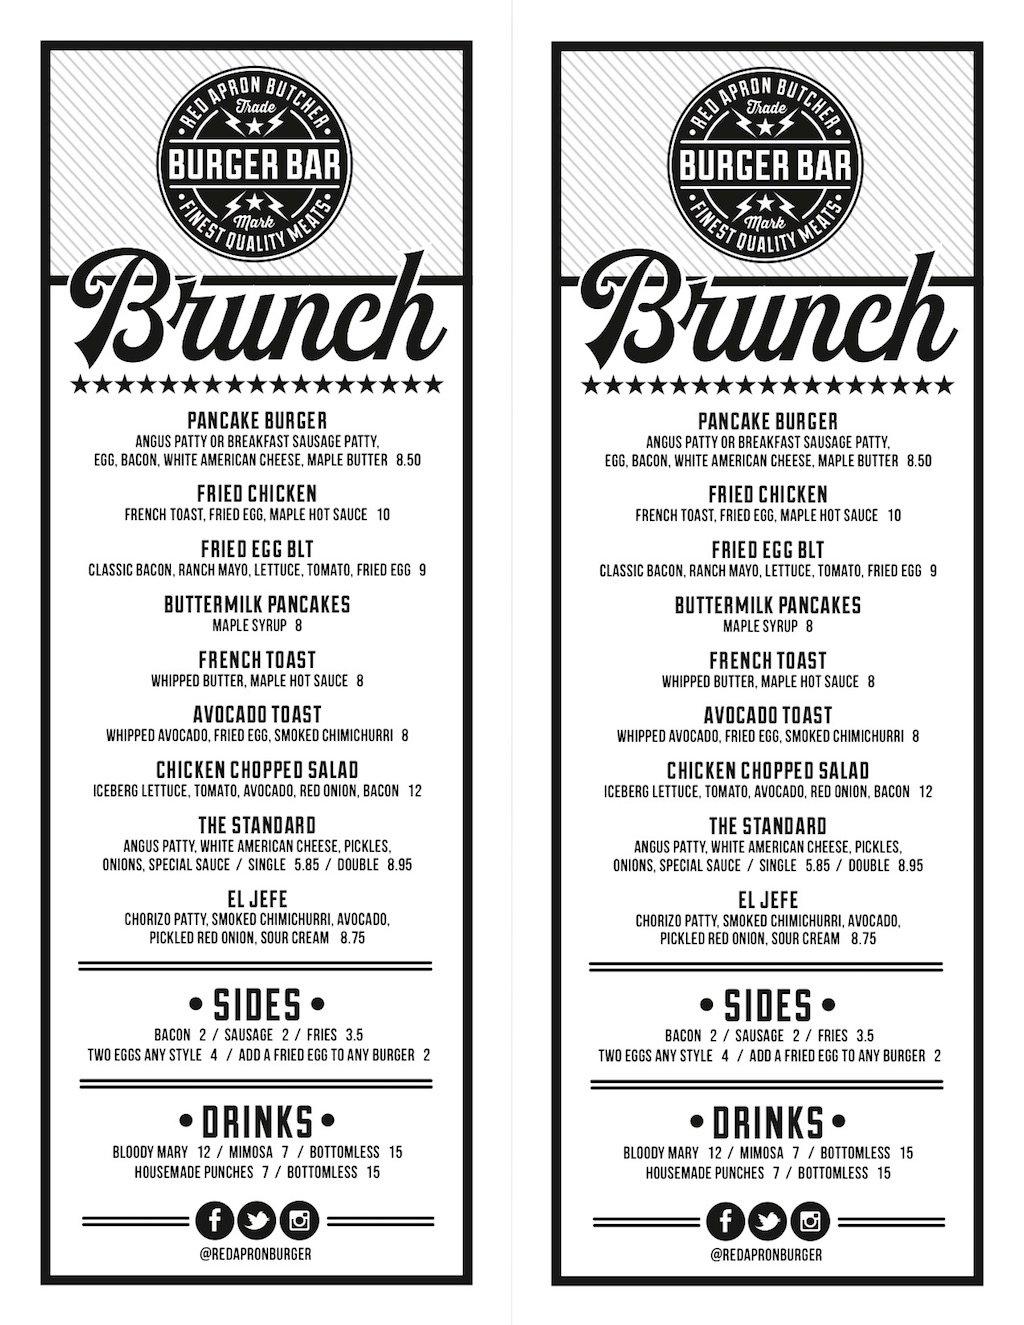 White apron sandwiches dc menu - Red Apron Burger Bar 1323 Connecticut Ave Nw